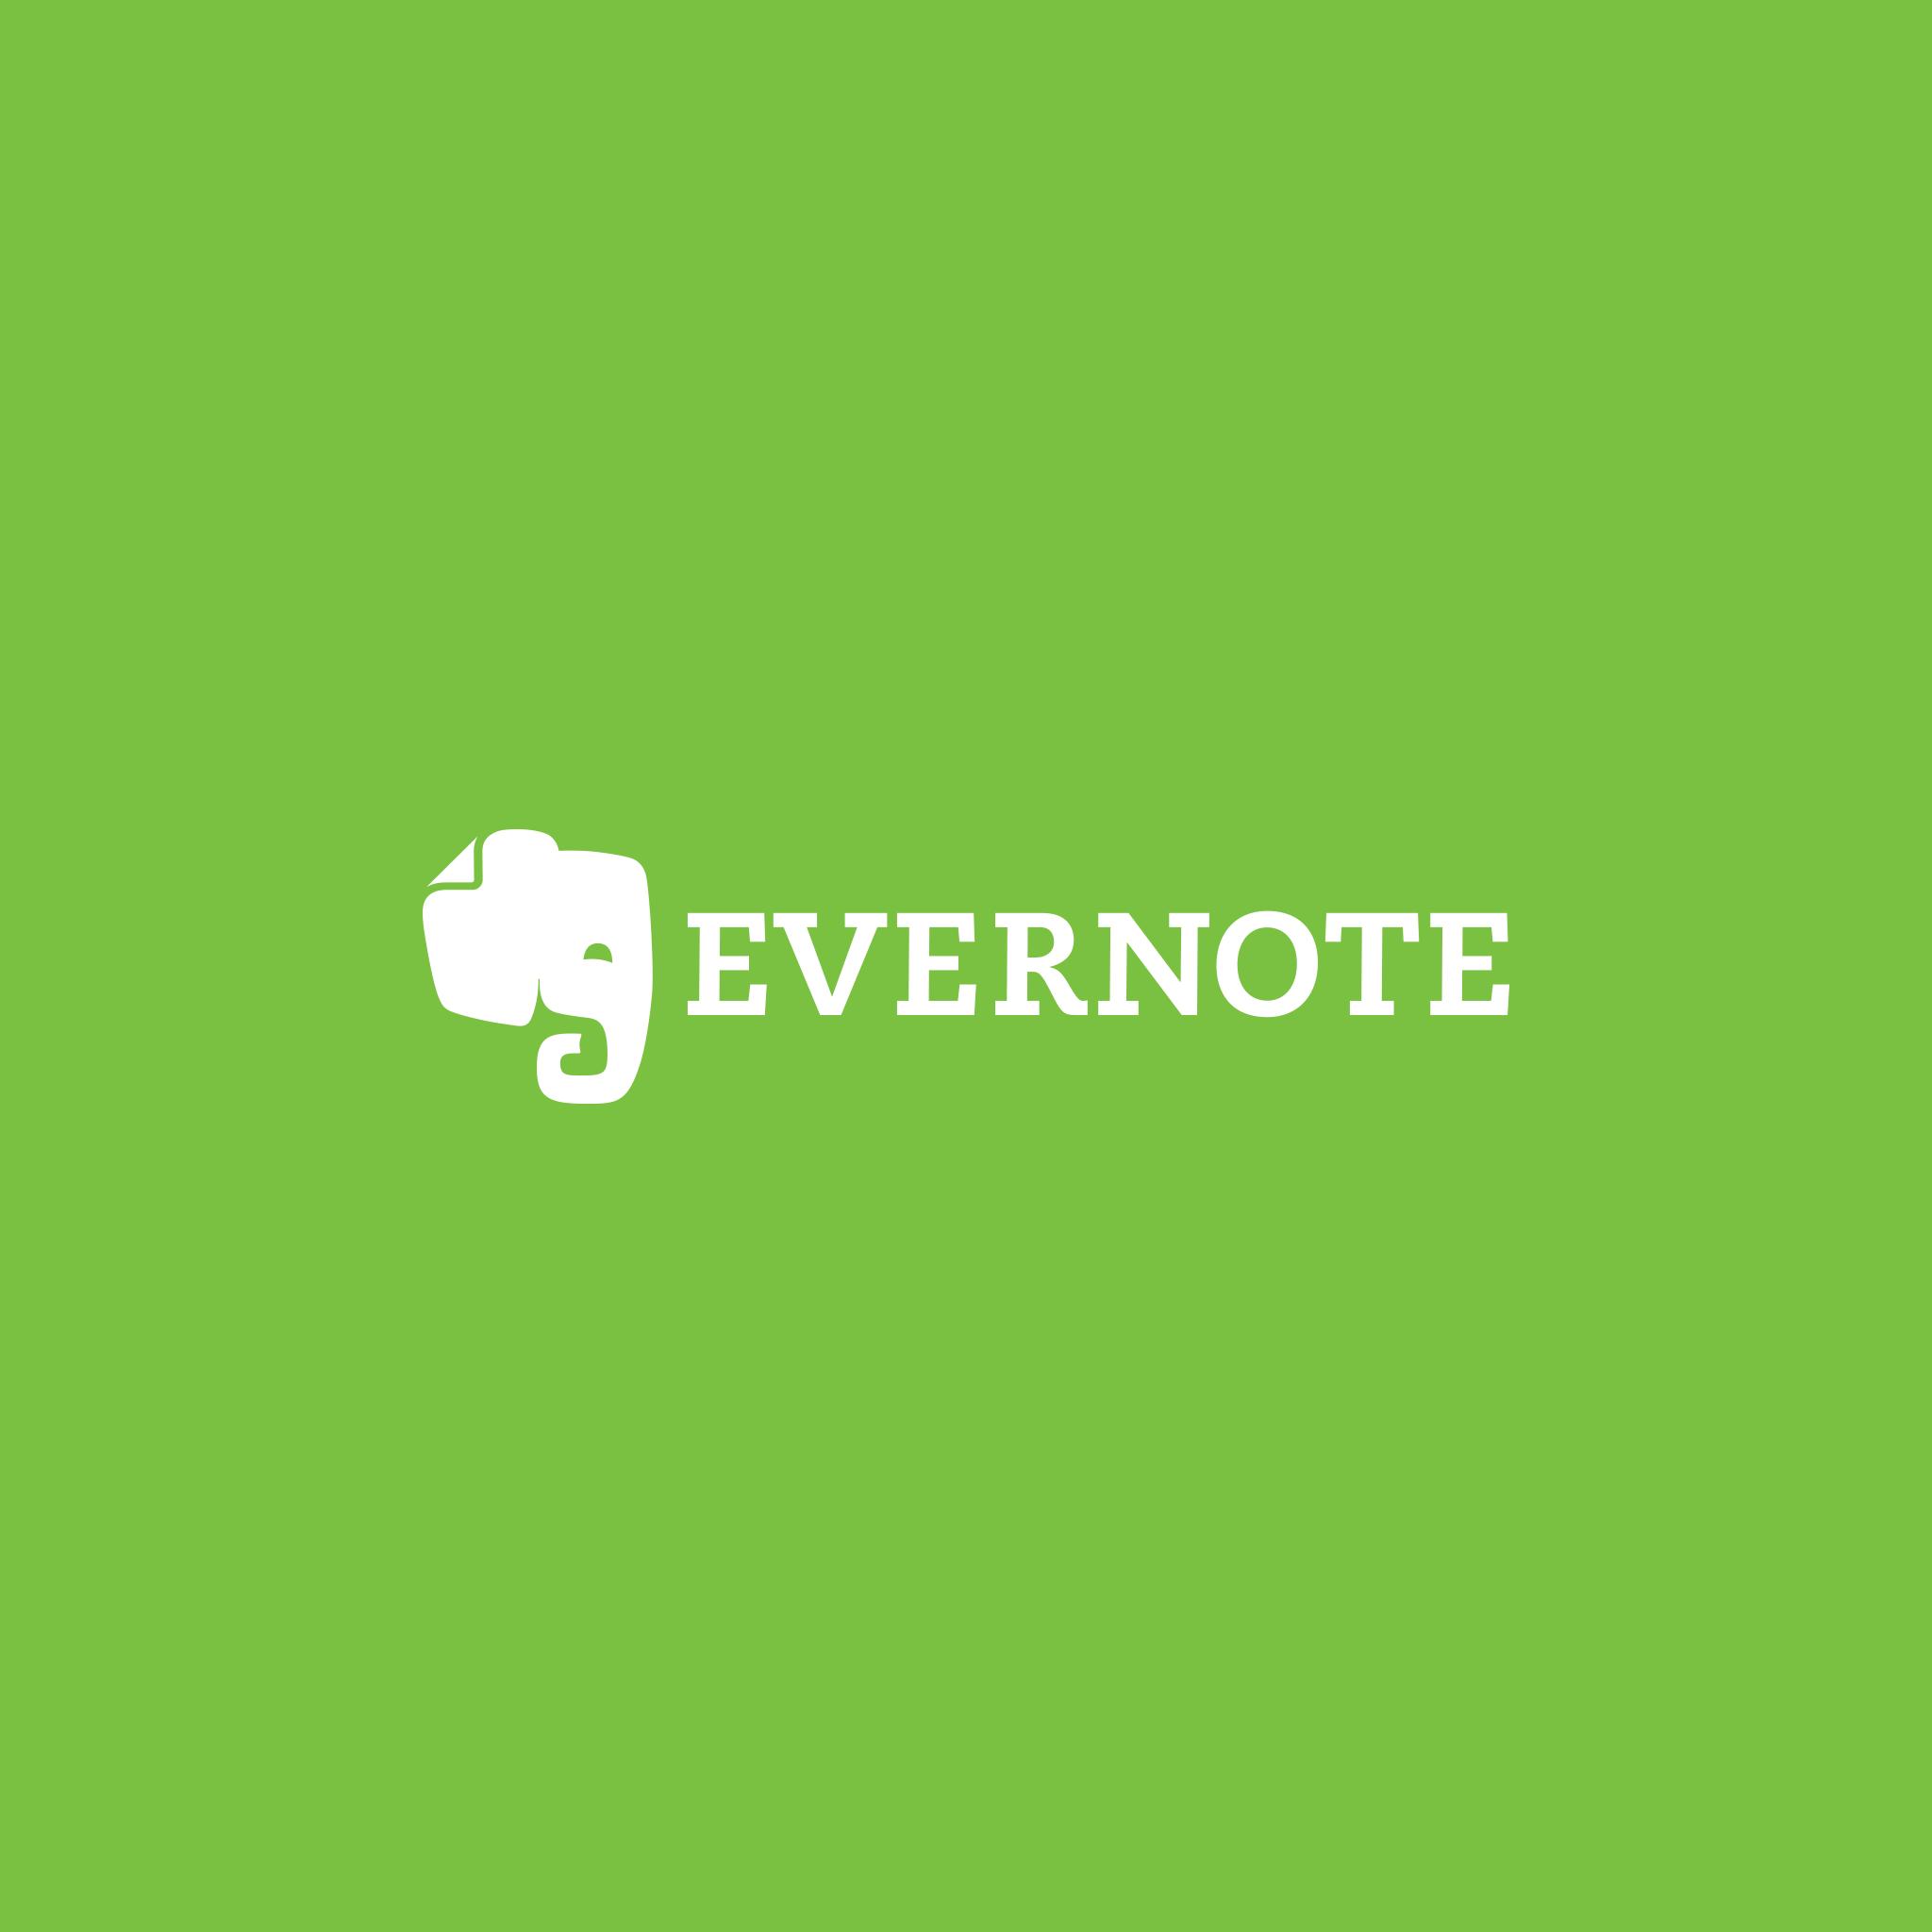 Evernote Yöneticileri